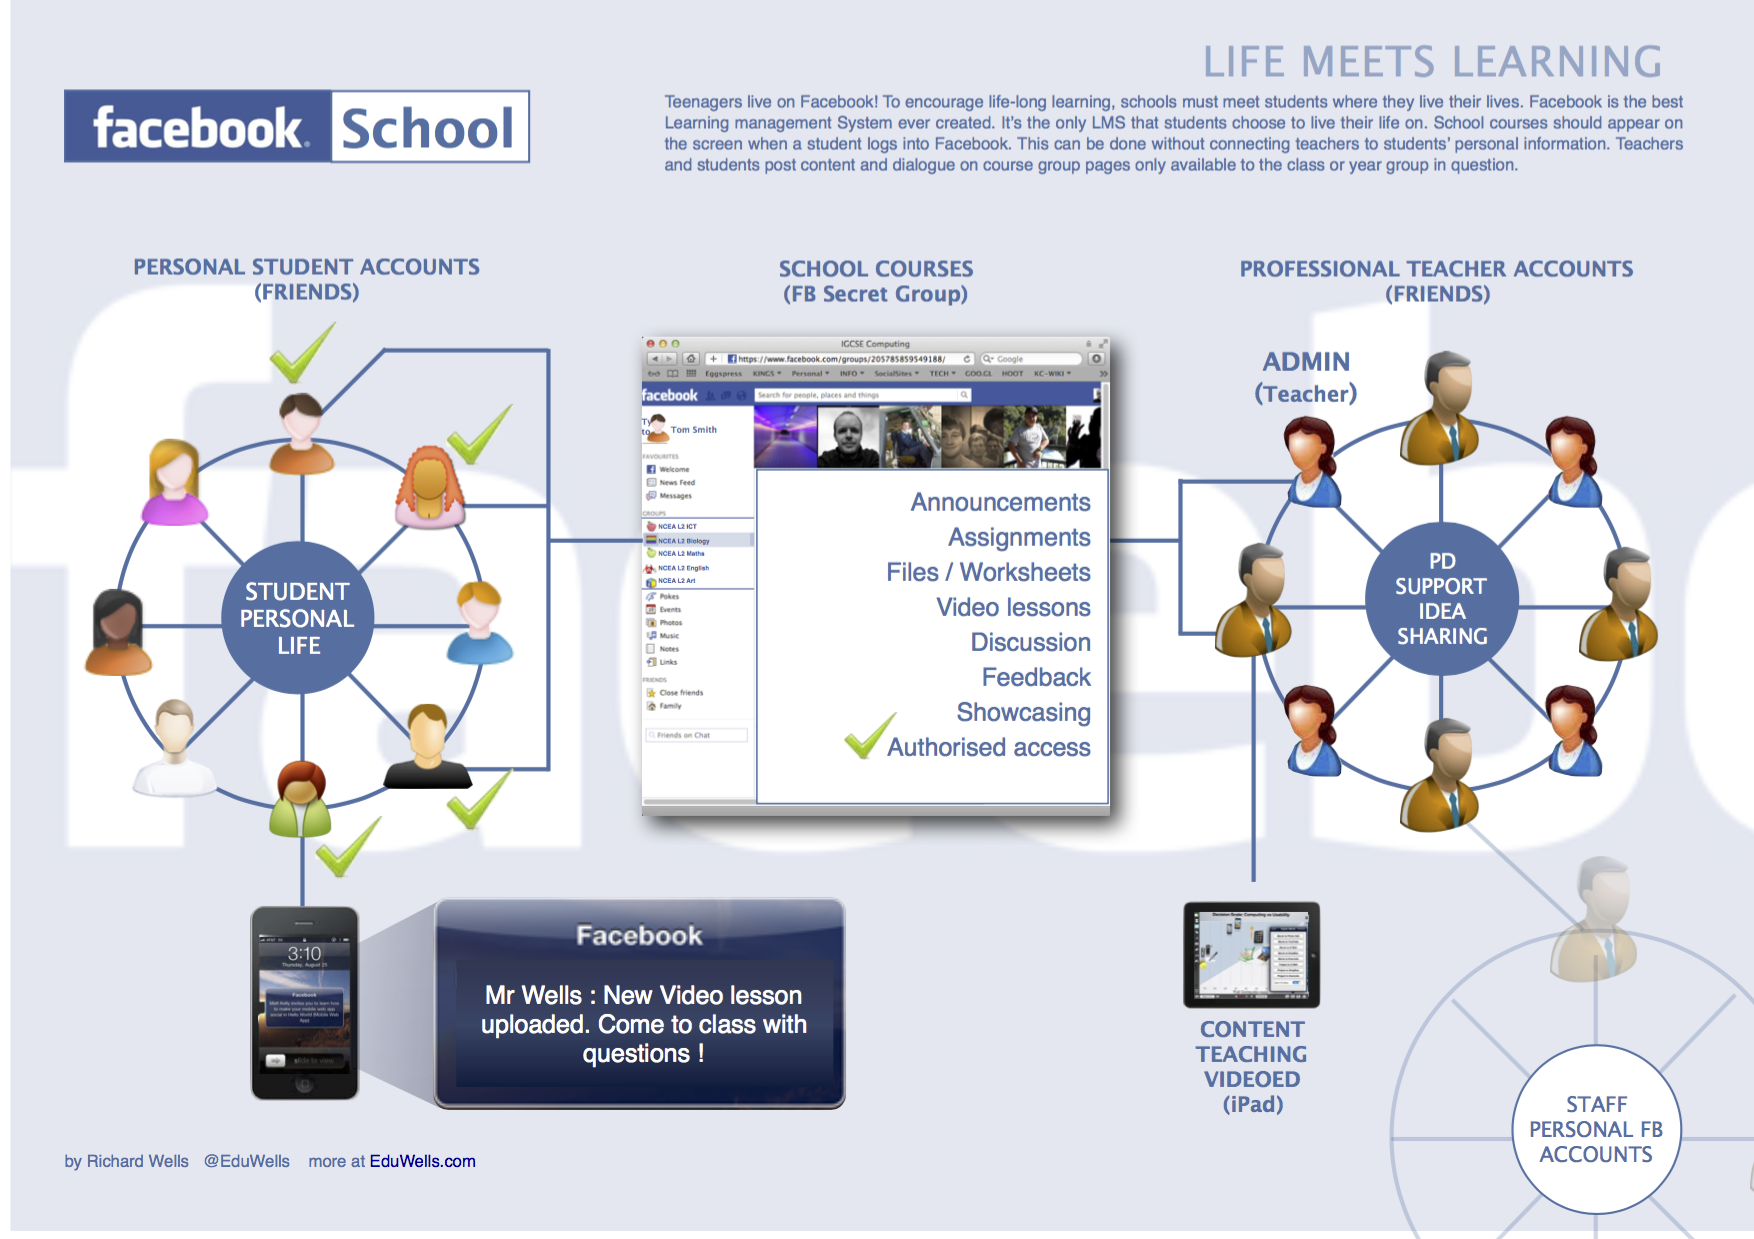 Facebook School